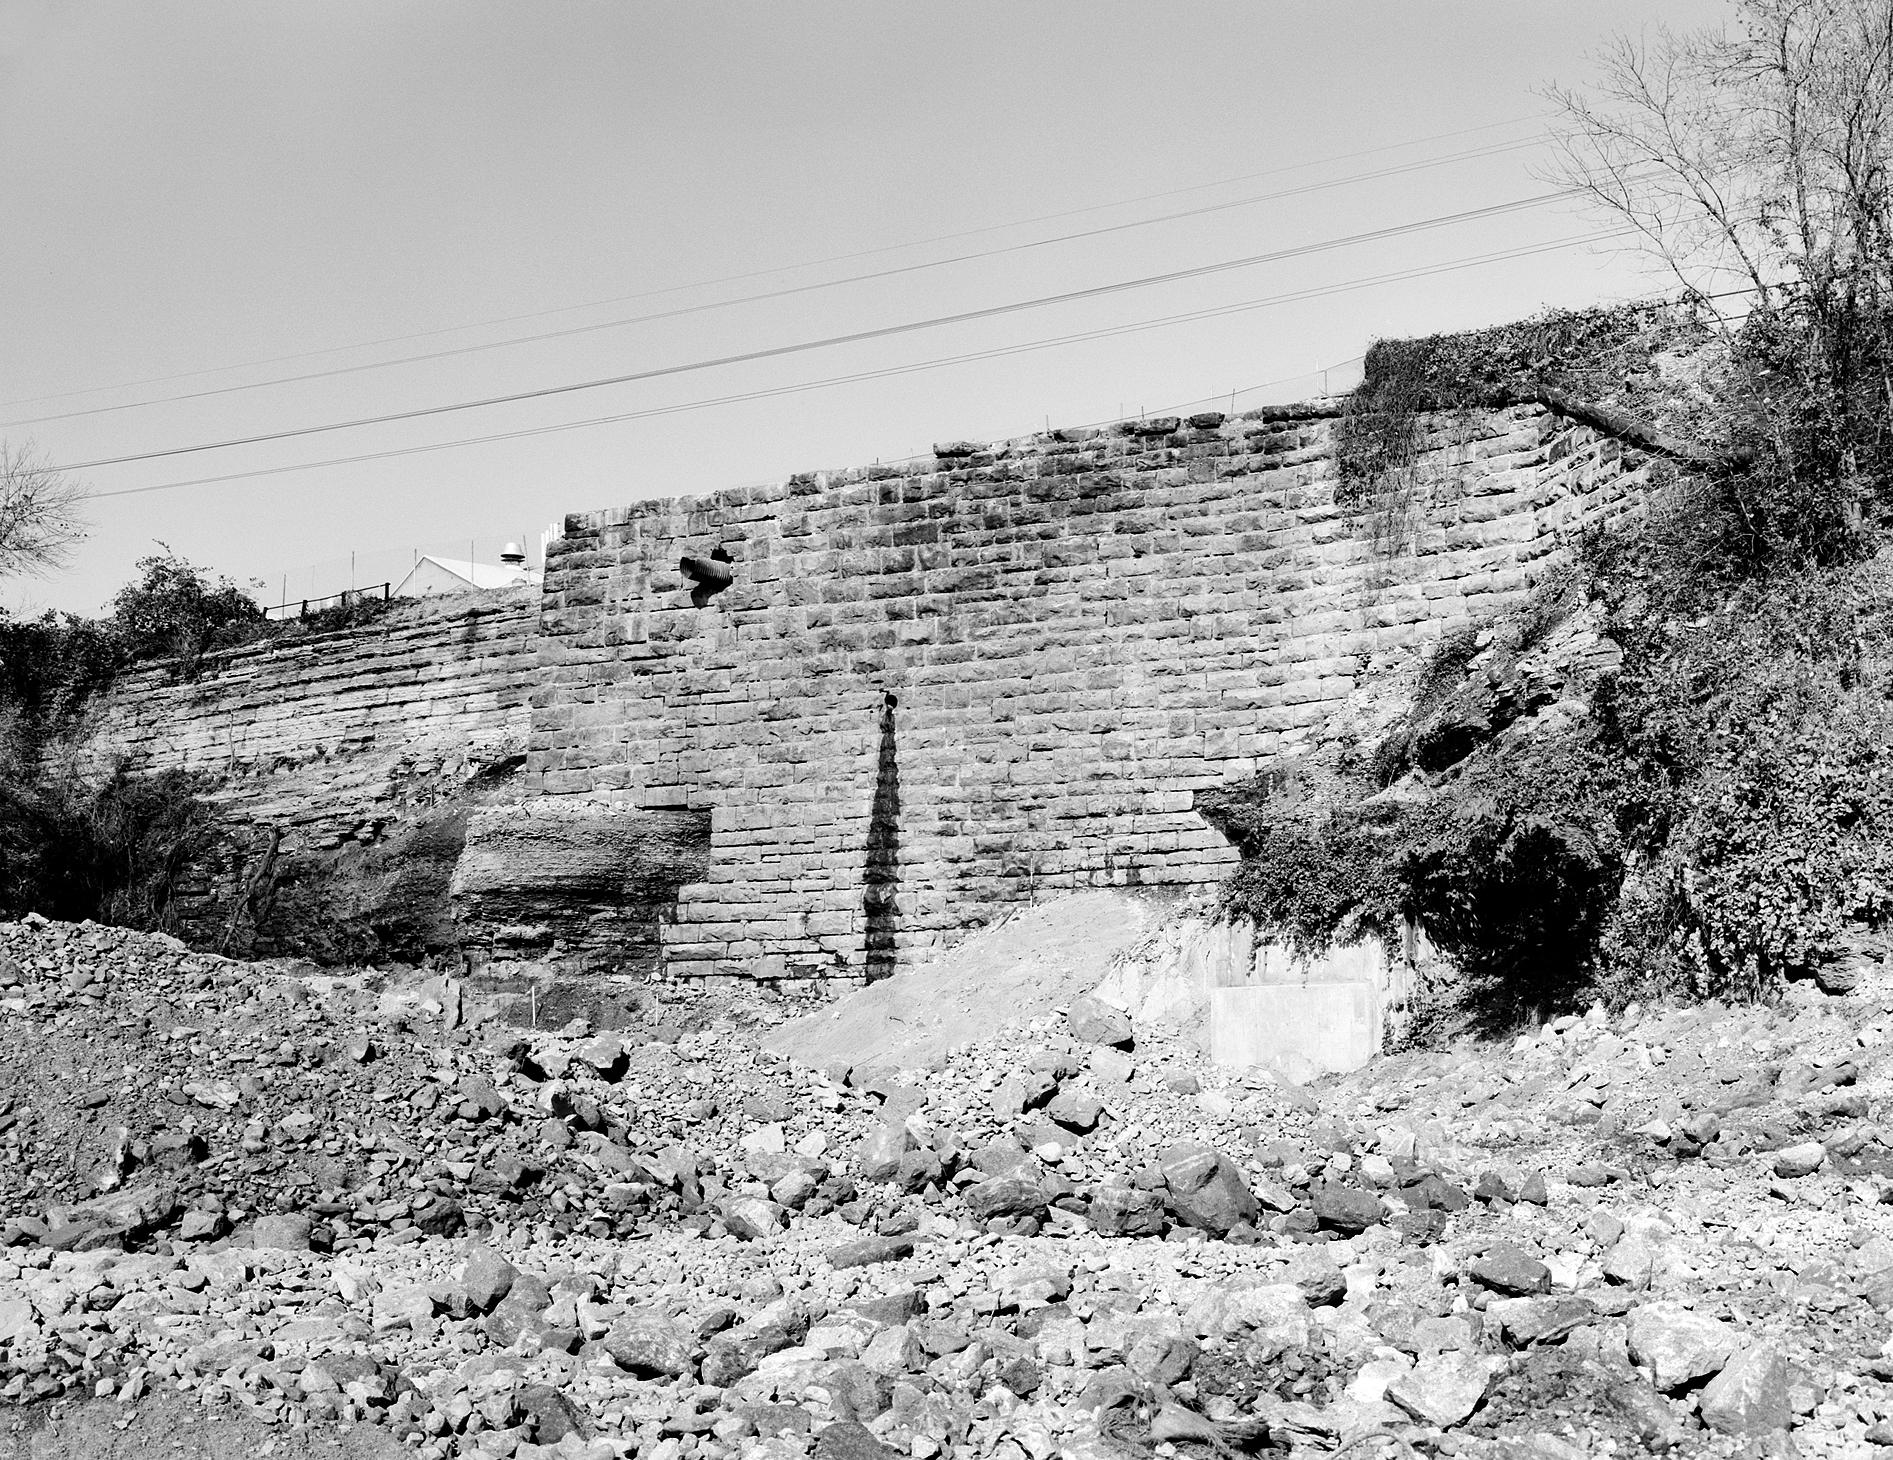 Oblique View - MHPR HE-MPC-5957-04 (Please credit Daniel R. Pratt and the Minnesota Historic Property Record)